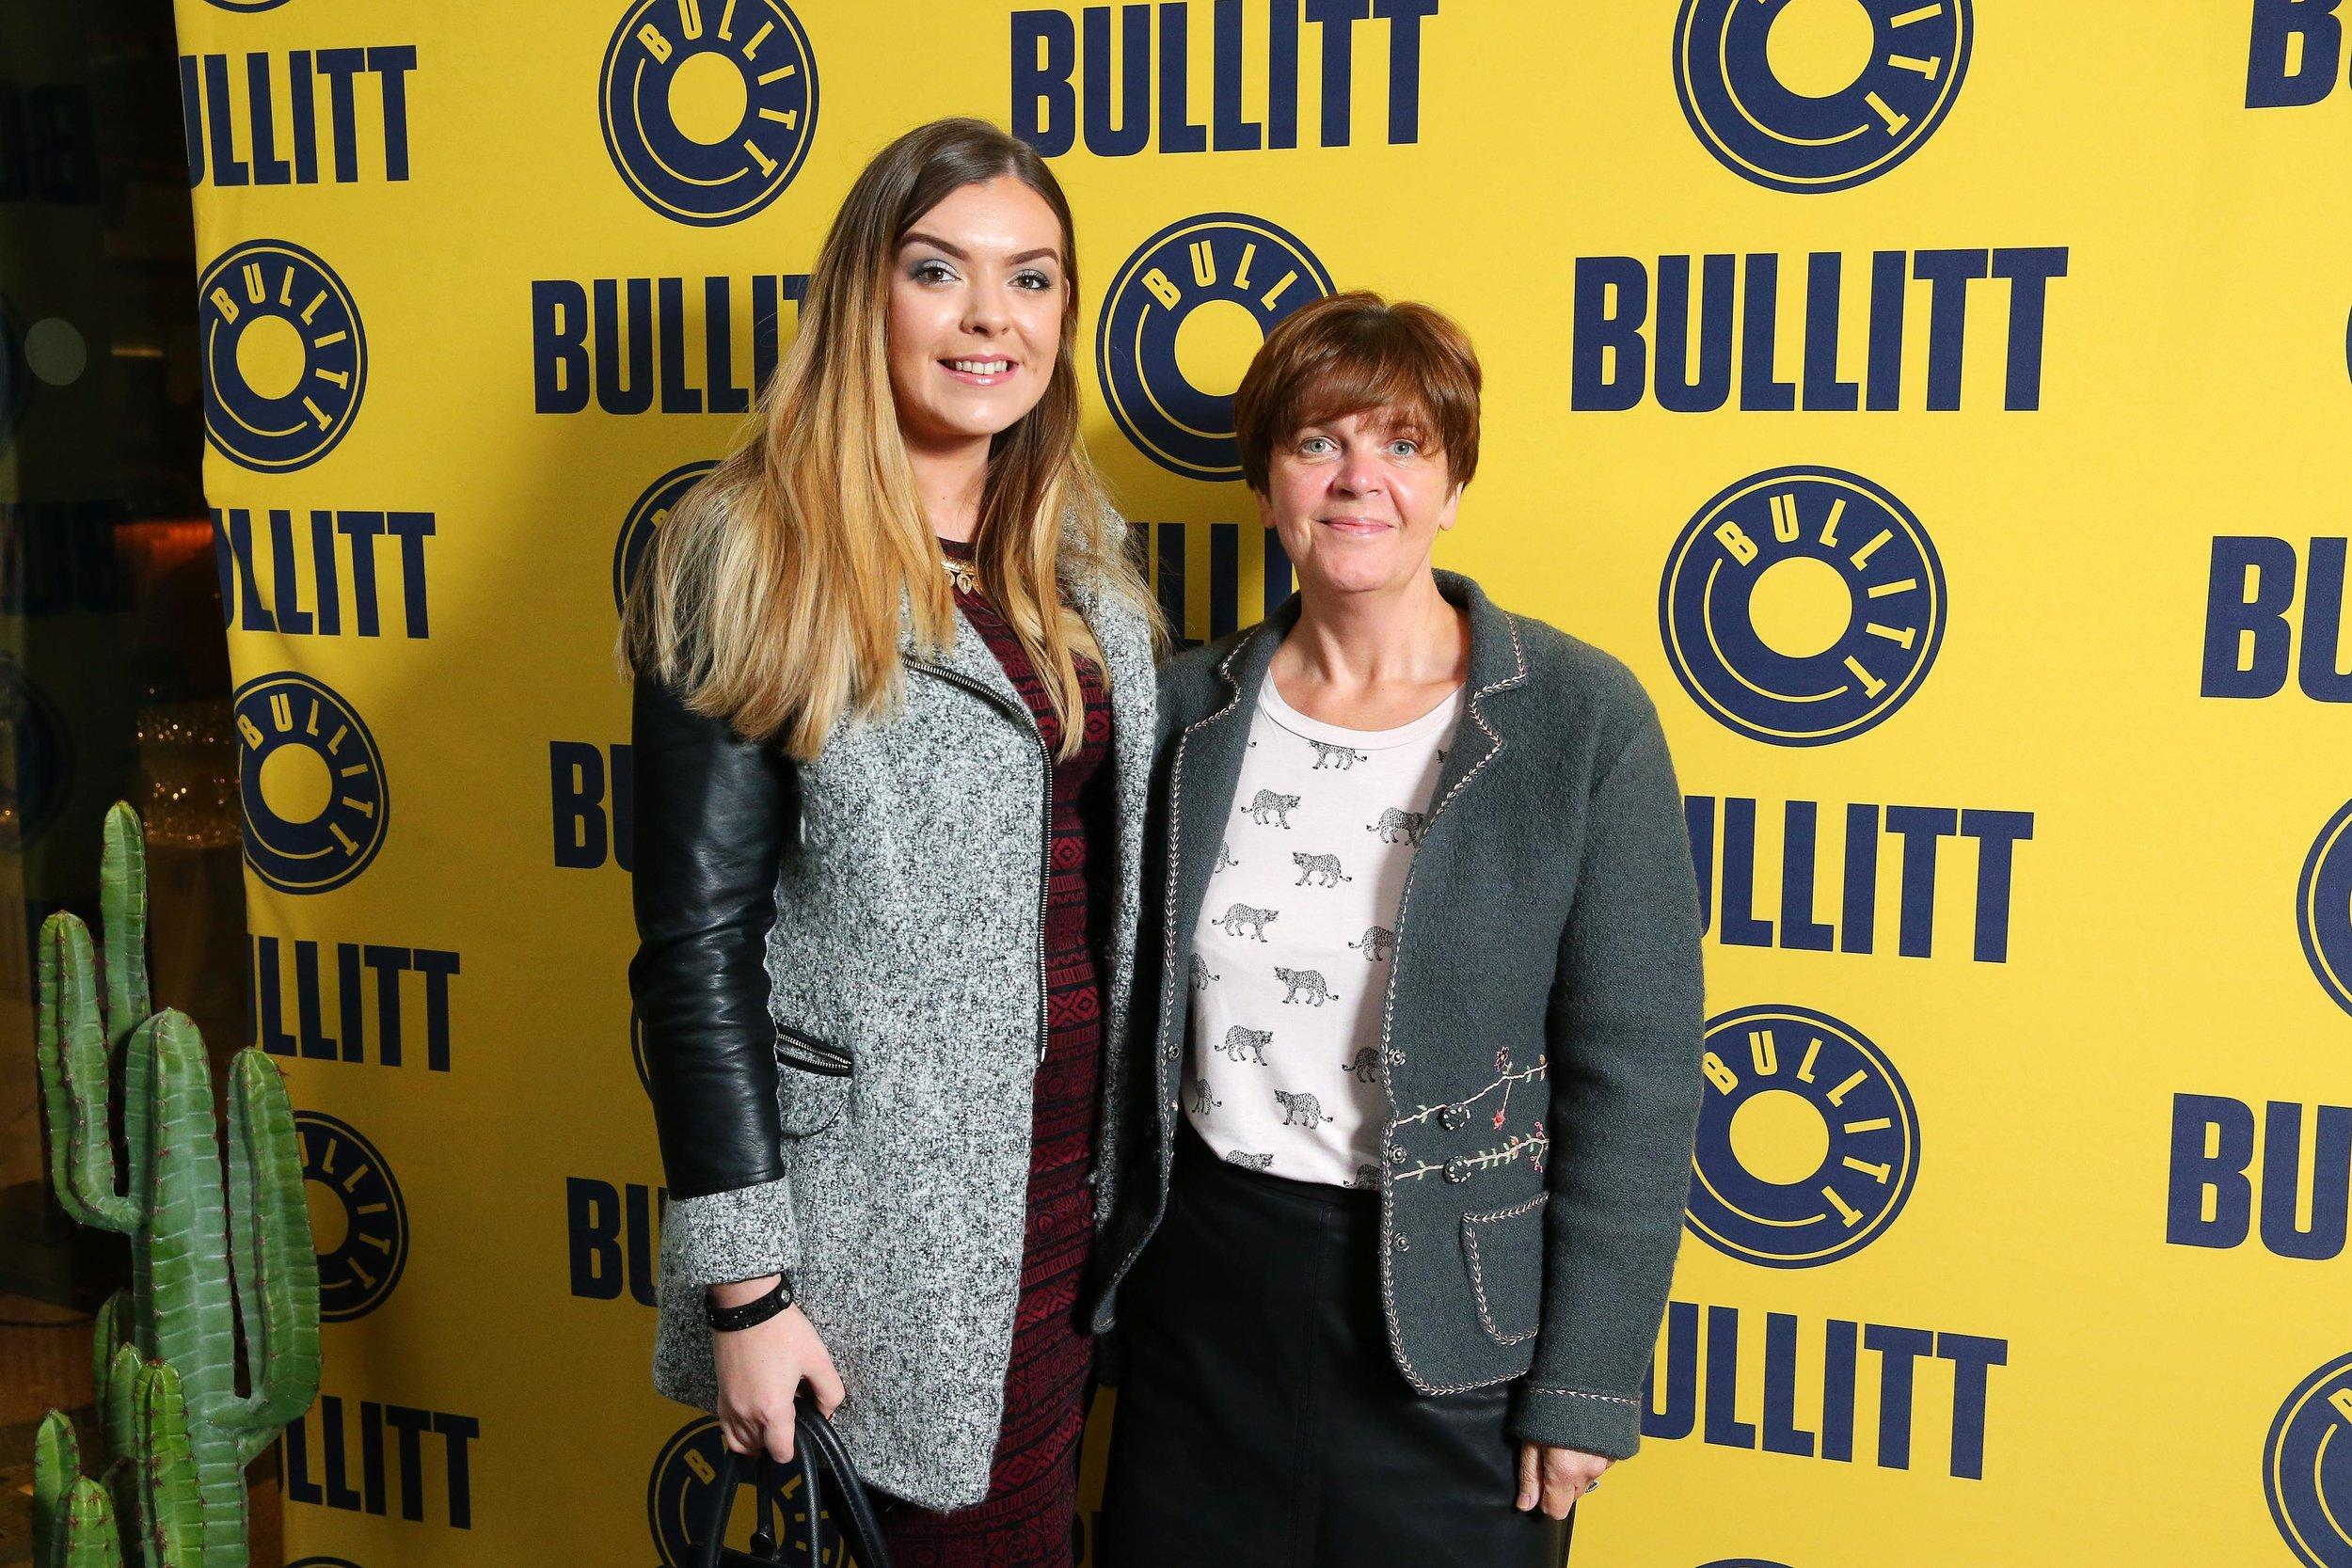 Bullitt Launch Socials 10.JPG